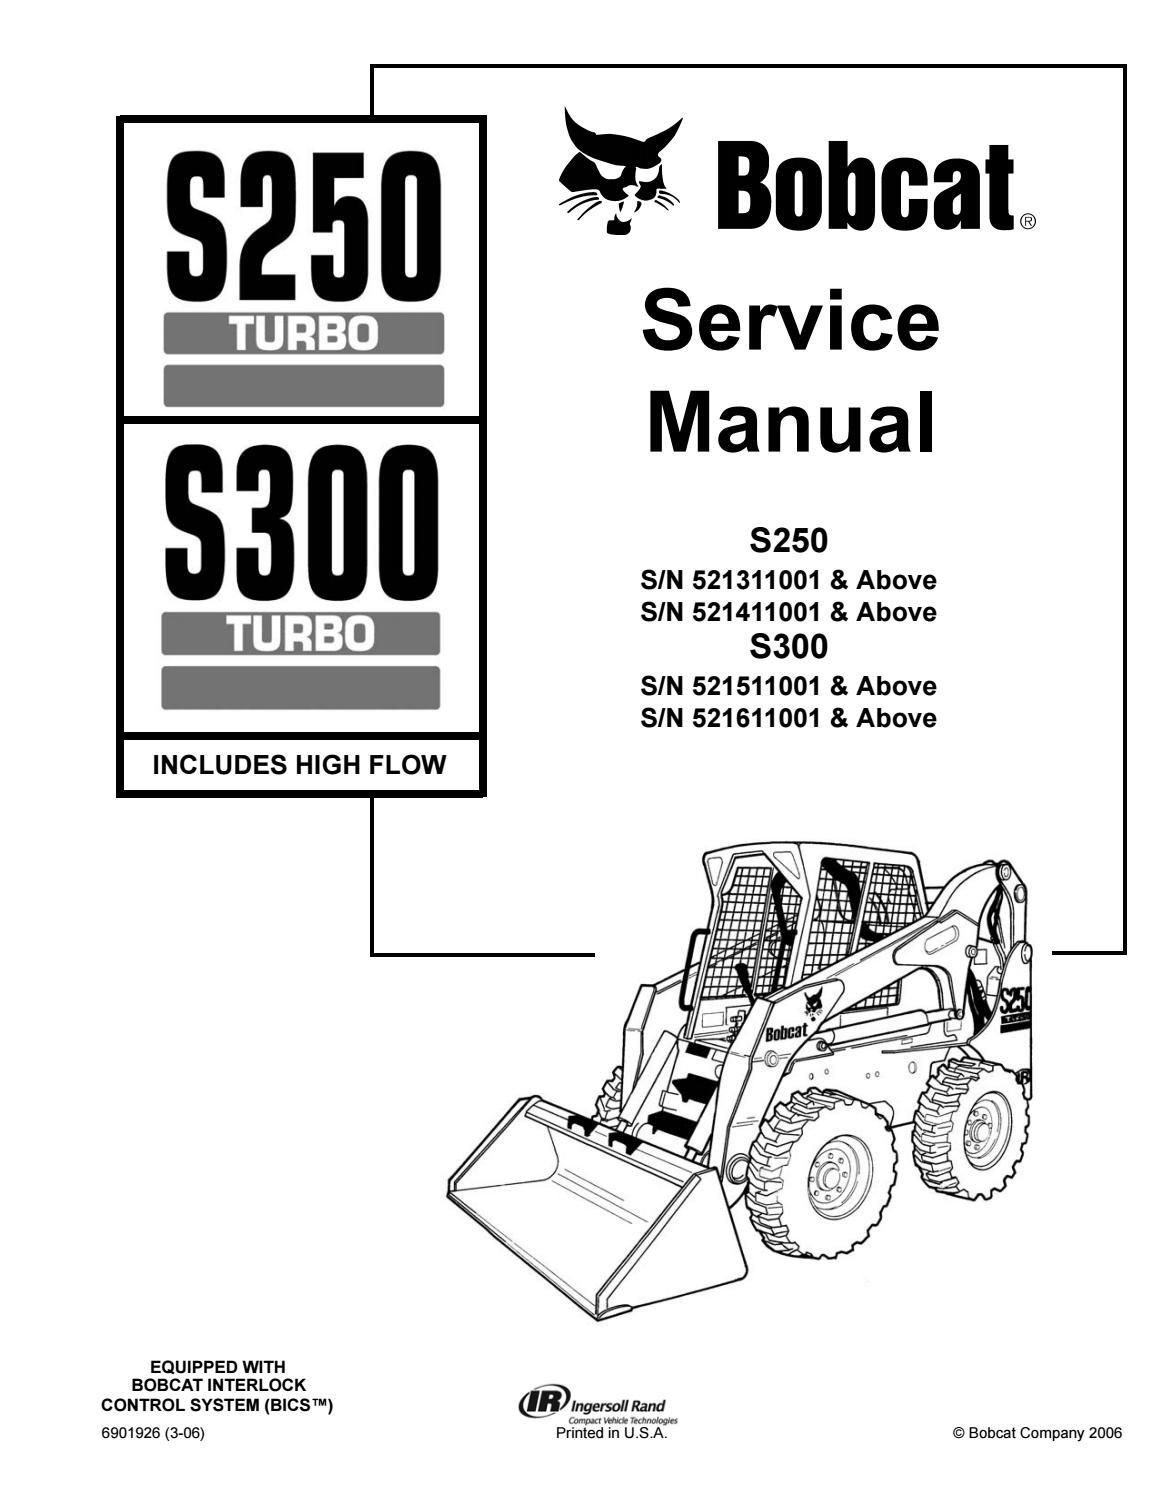 hight resolution of bobcat s300 skid steer loader service repair manual sn 521511001 above